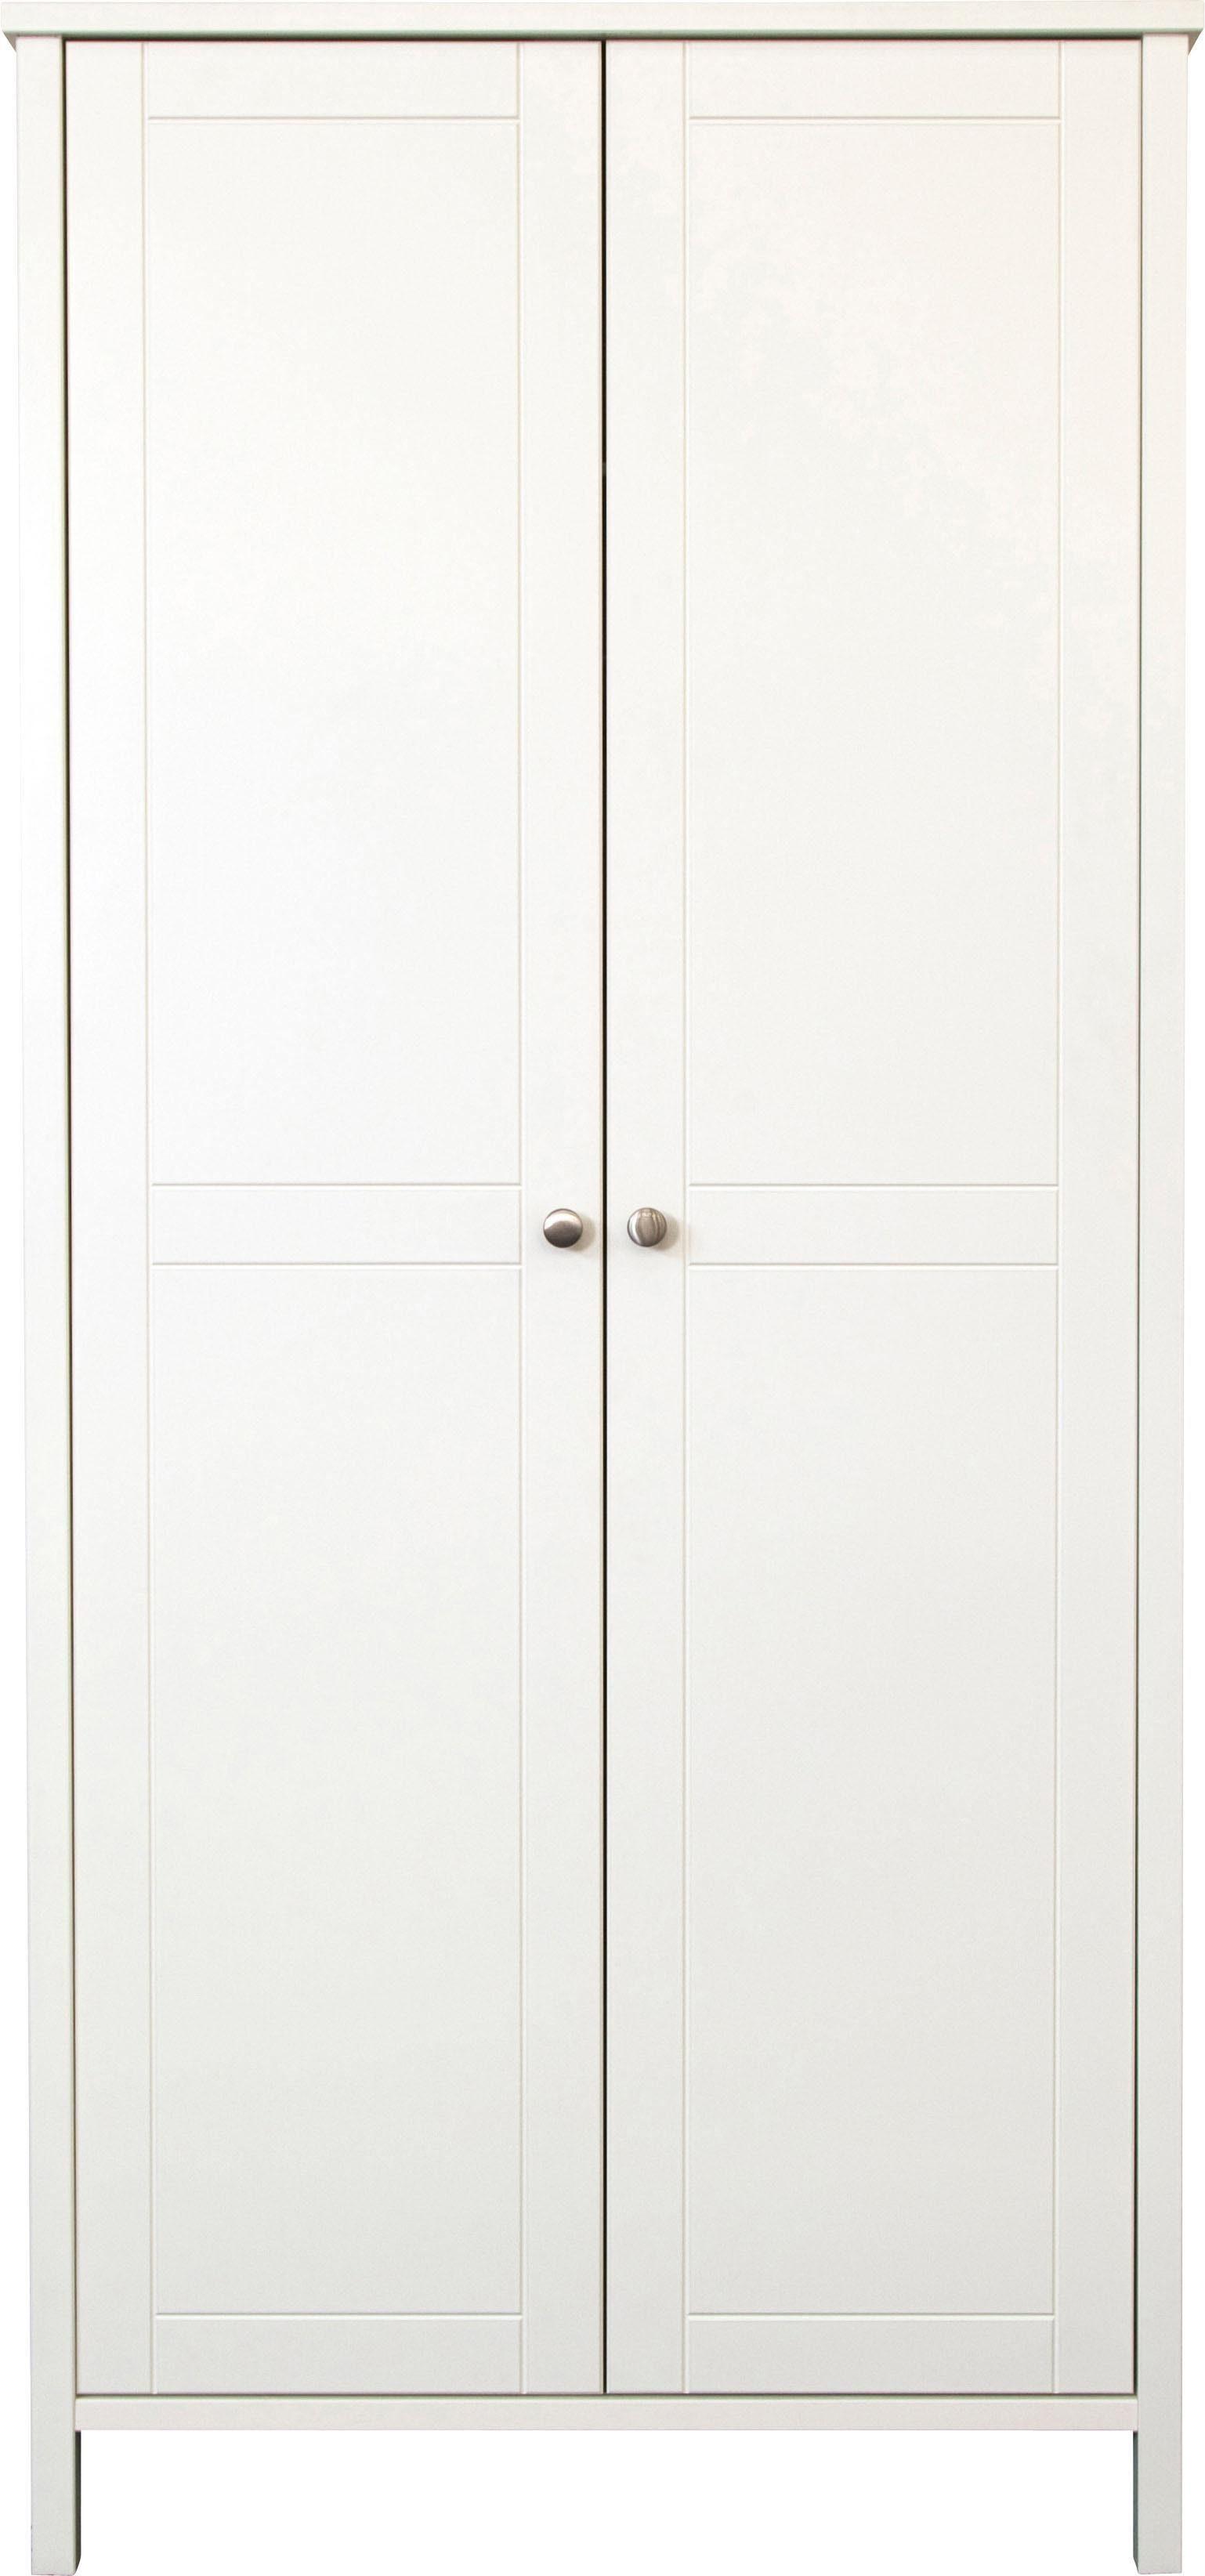 Home affaire Kleiderschrank «Tromsö», 2-trg., Breite 90 cm